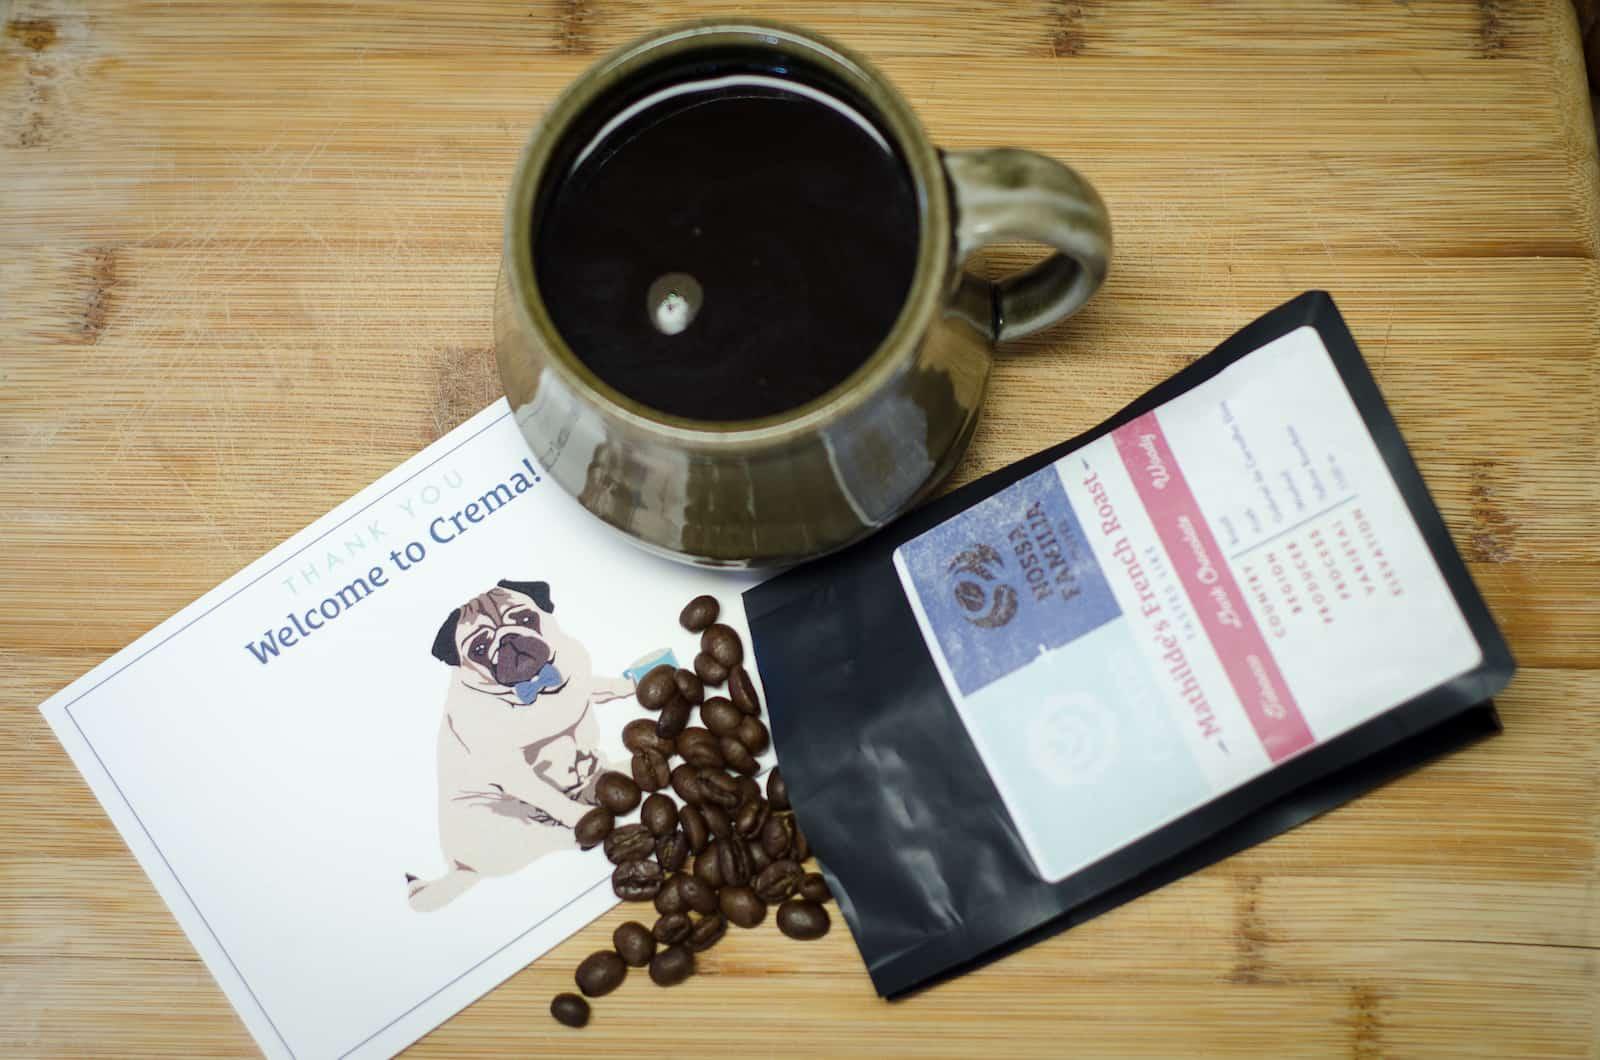 crema coffee tasting